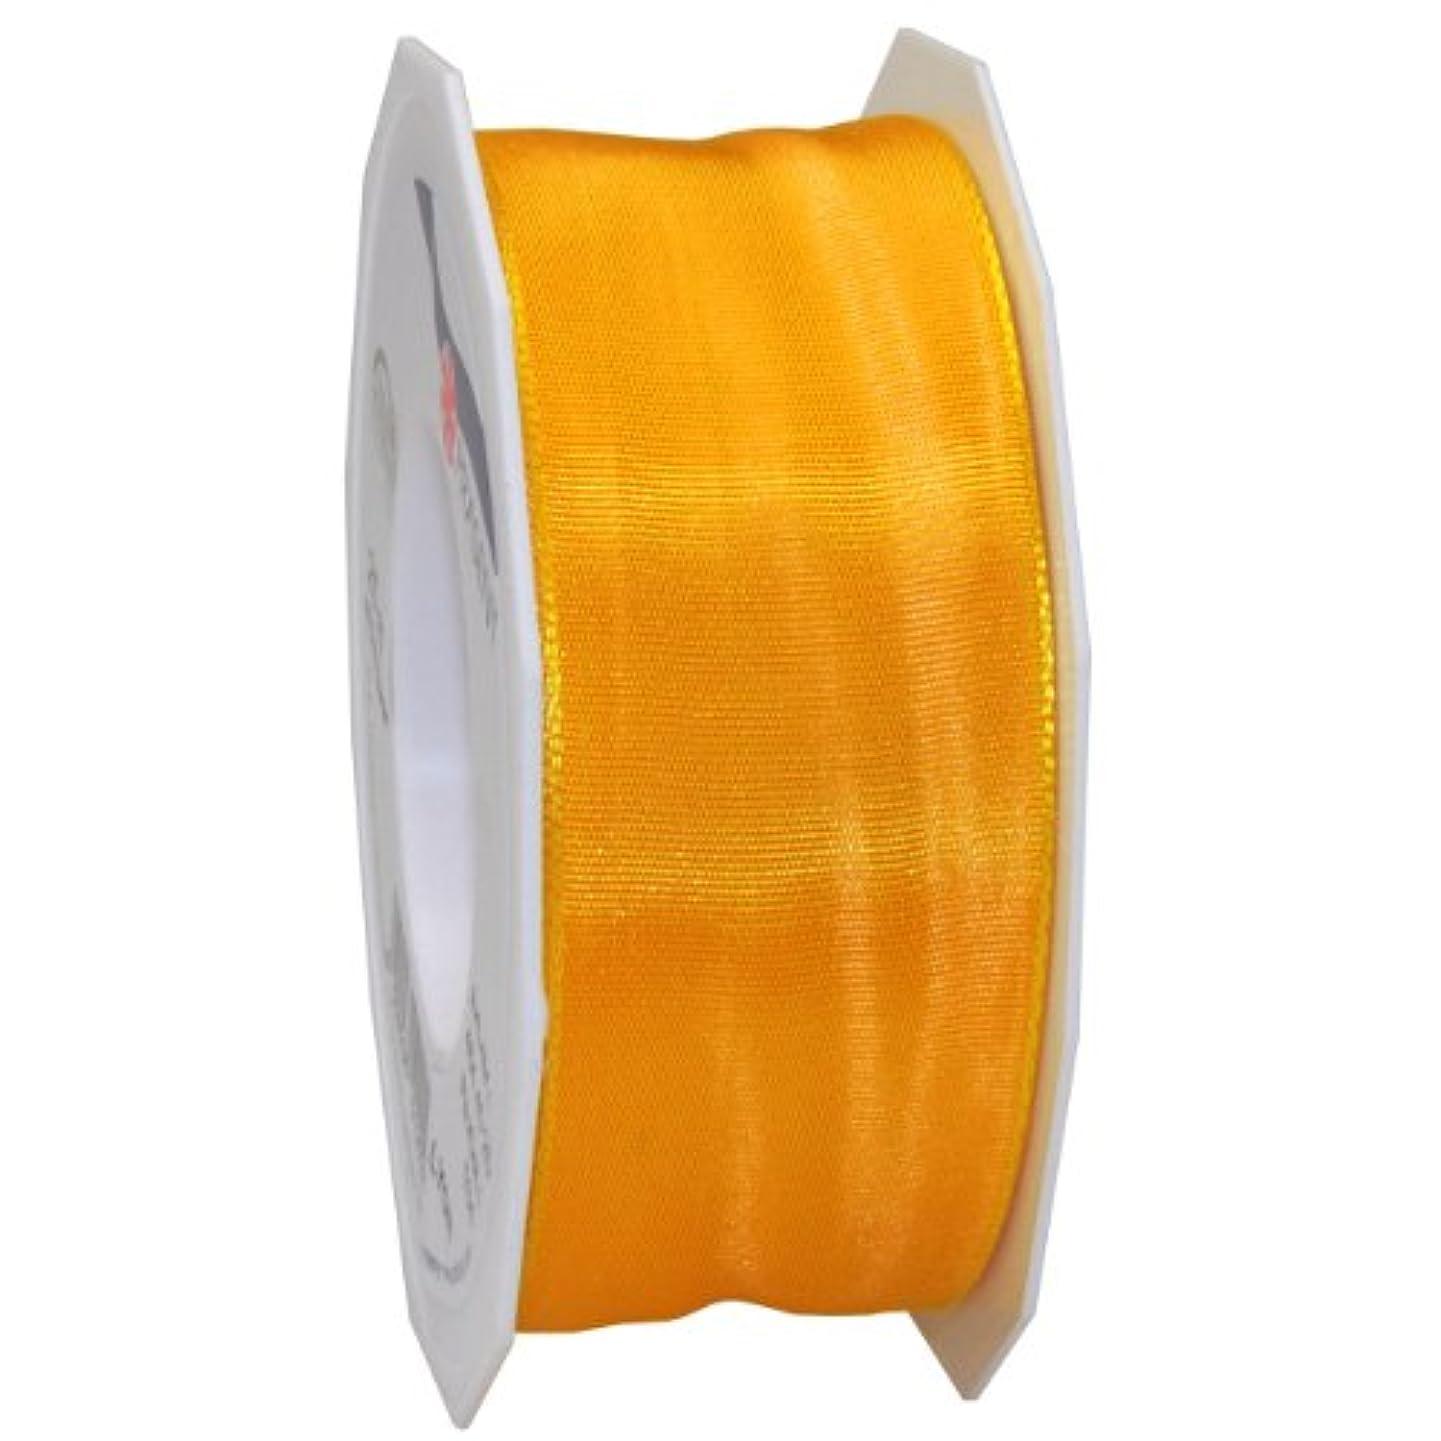 Morex Ribbon French Wired Lyon Fabric Ribbon, 1-1/2-Inch by 27-Yard, Canary Yellow